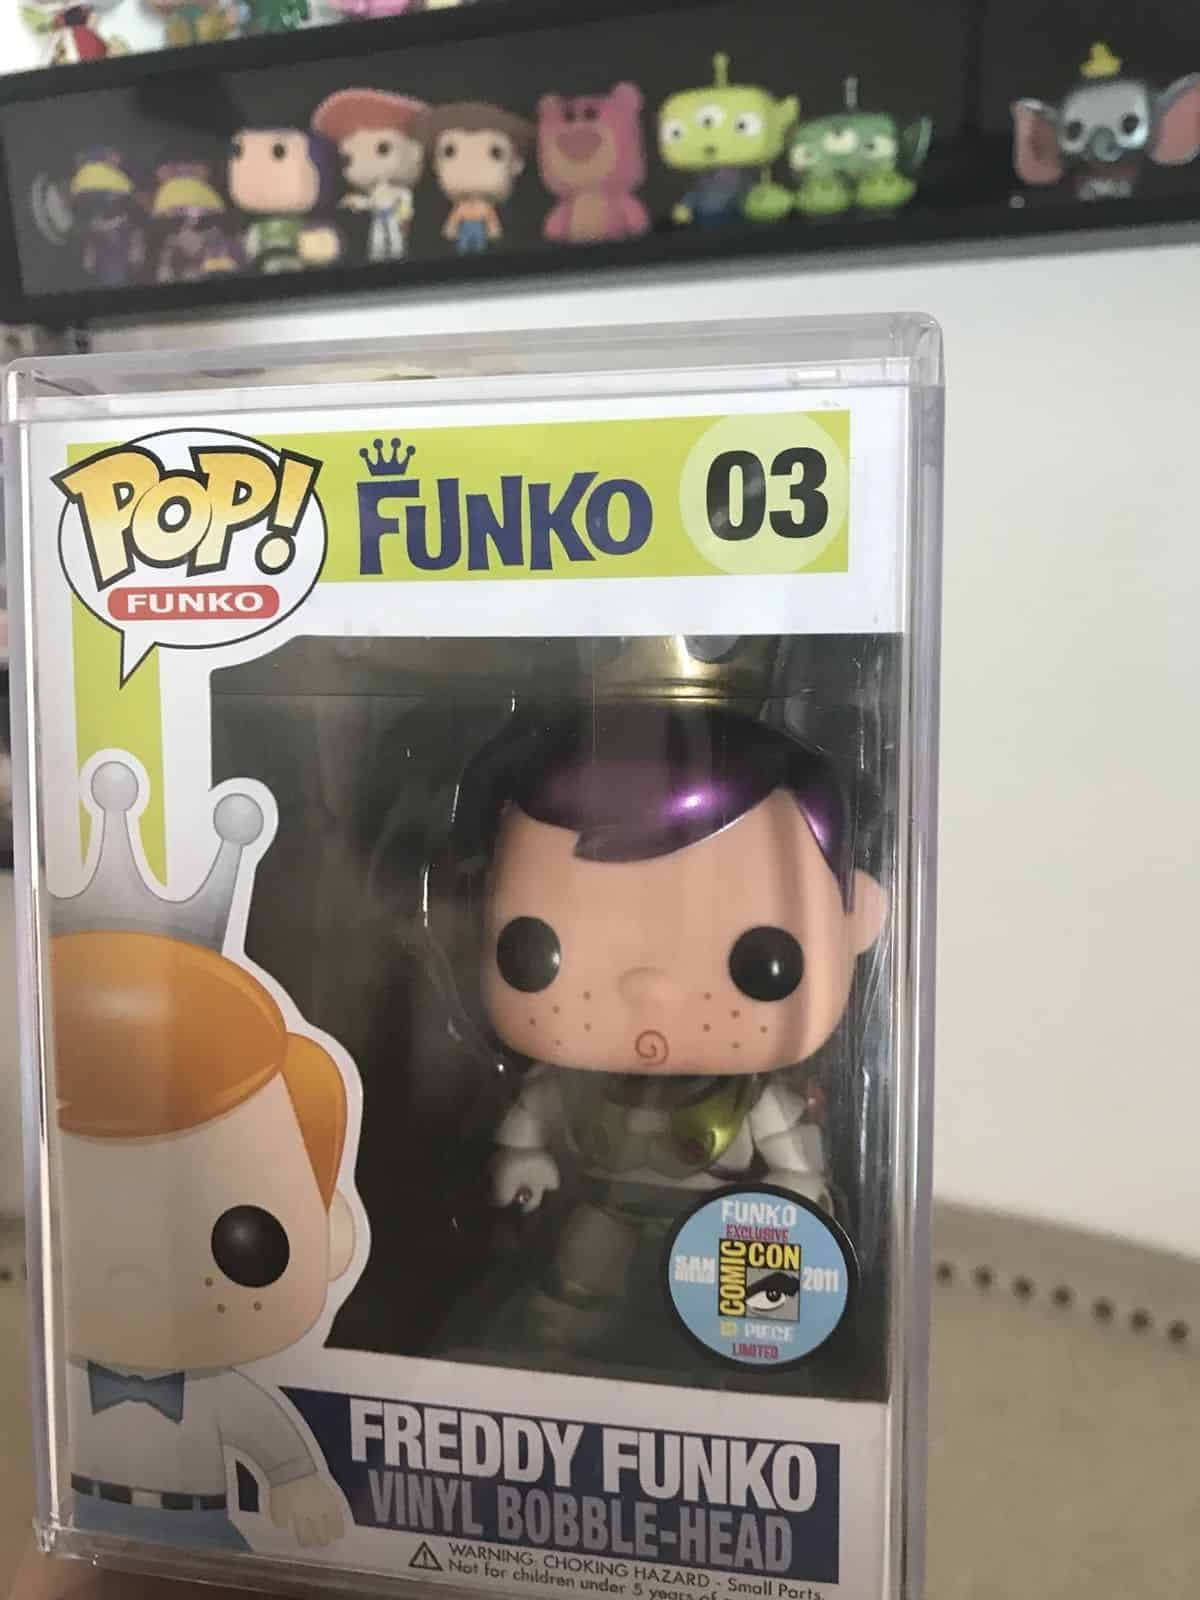 Most Expensive Funko Pops - Buzz Lightyear Freddy Funko Metallic